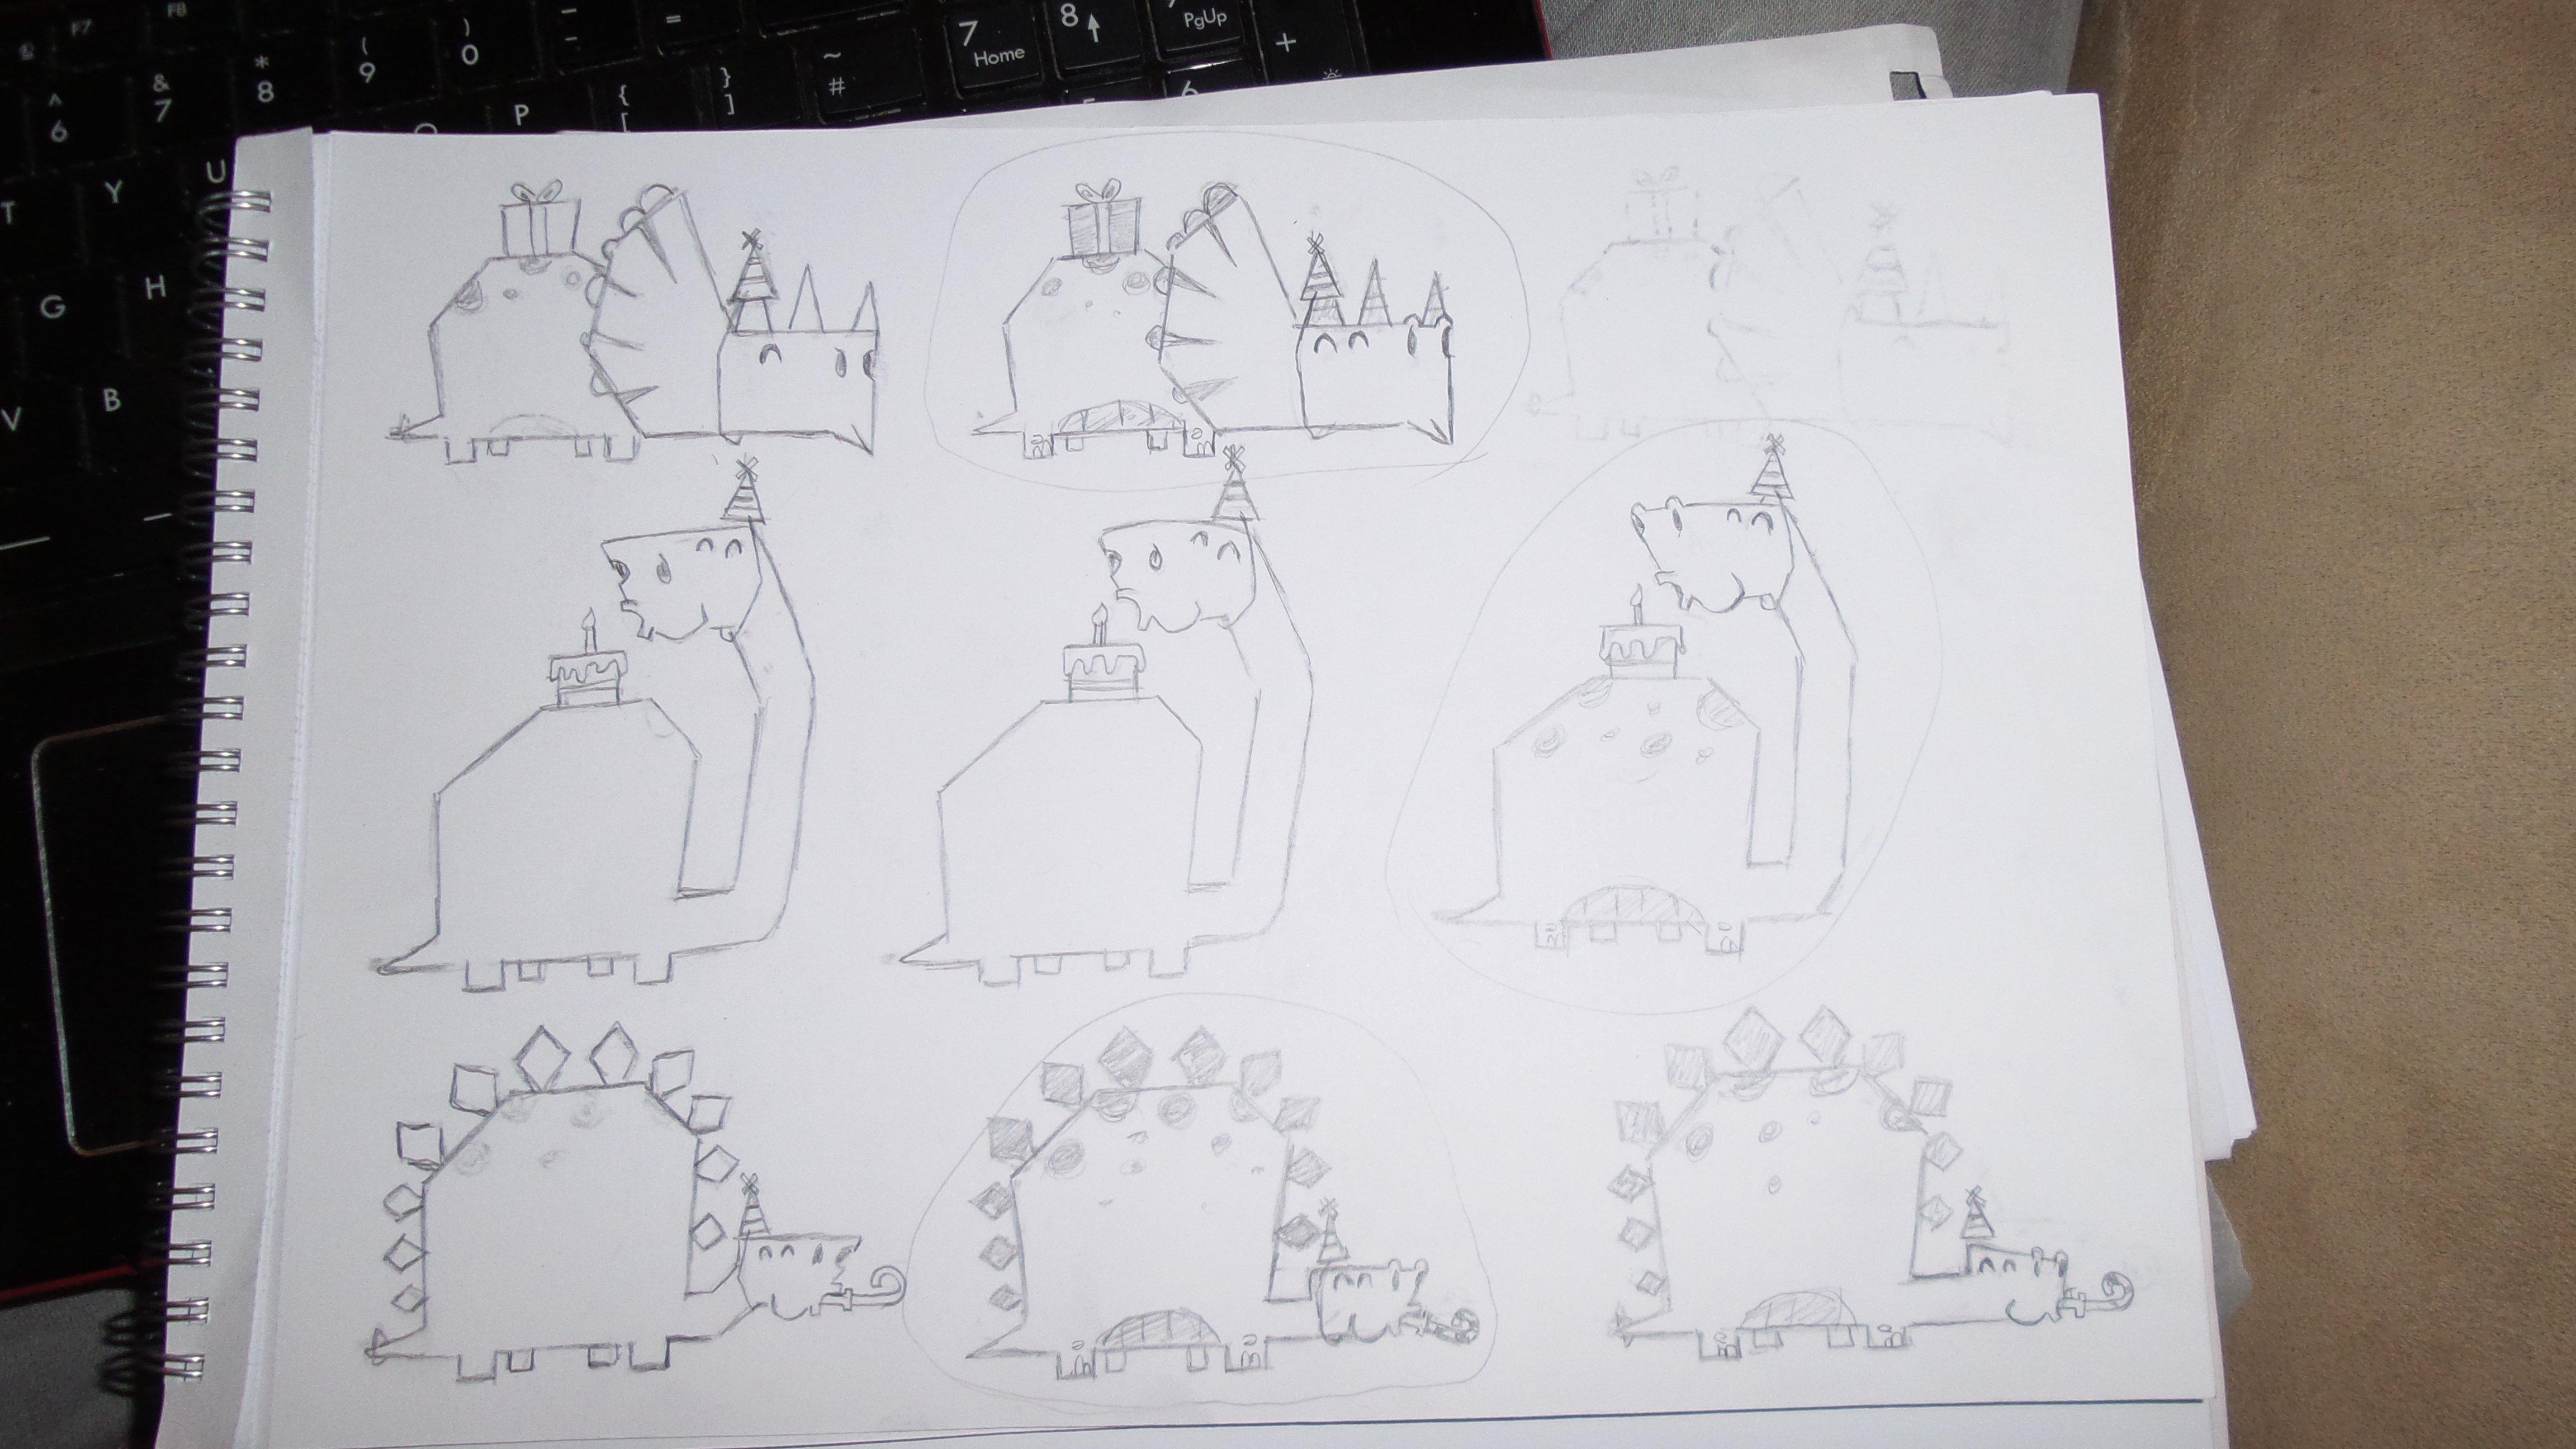 Triceratops Dinosaur invite sketch